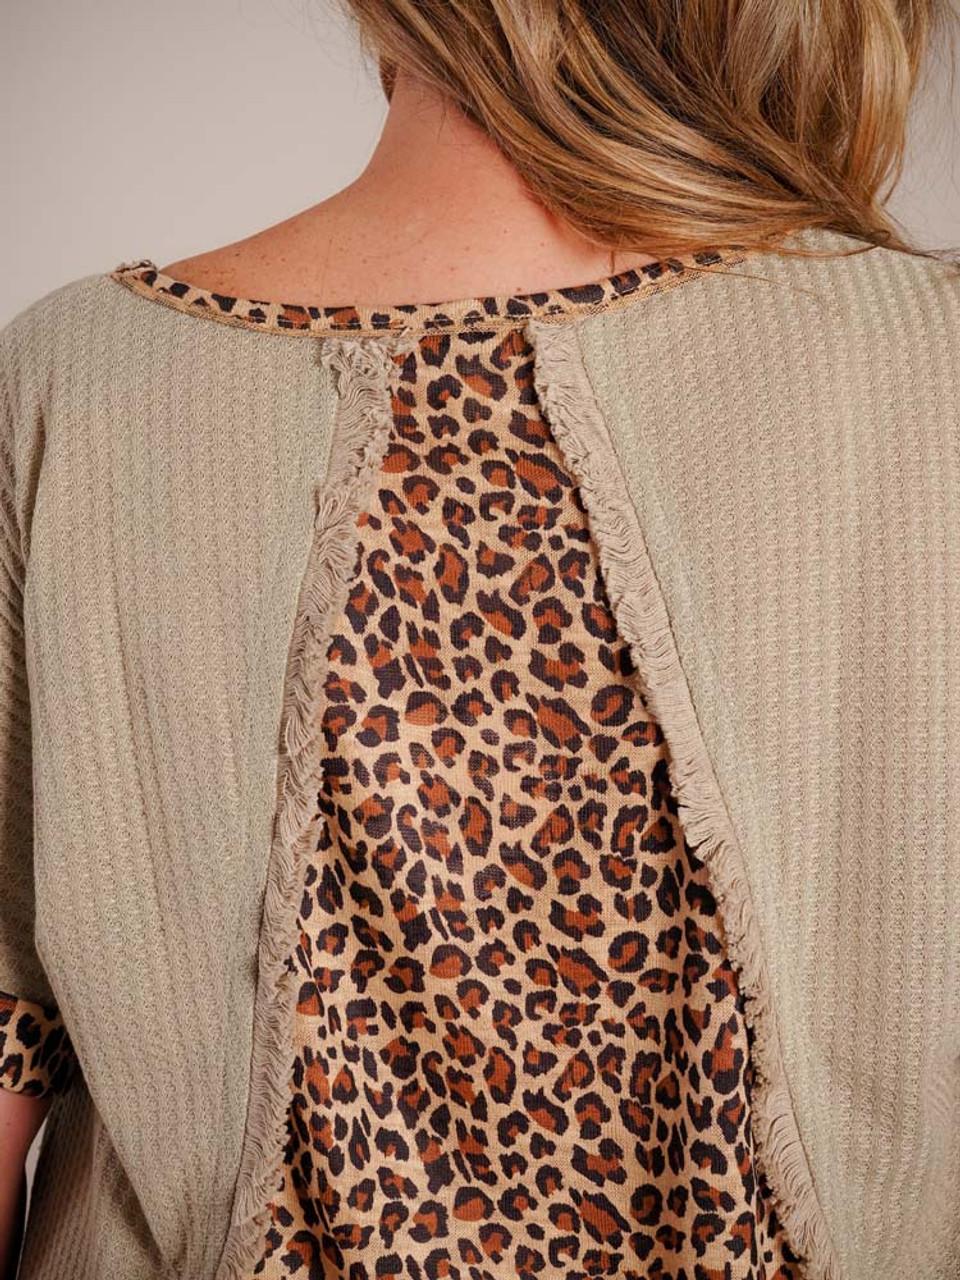 sage green leopard print top Umgee plus clothing curvy